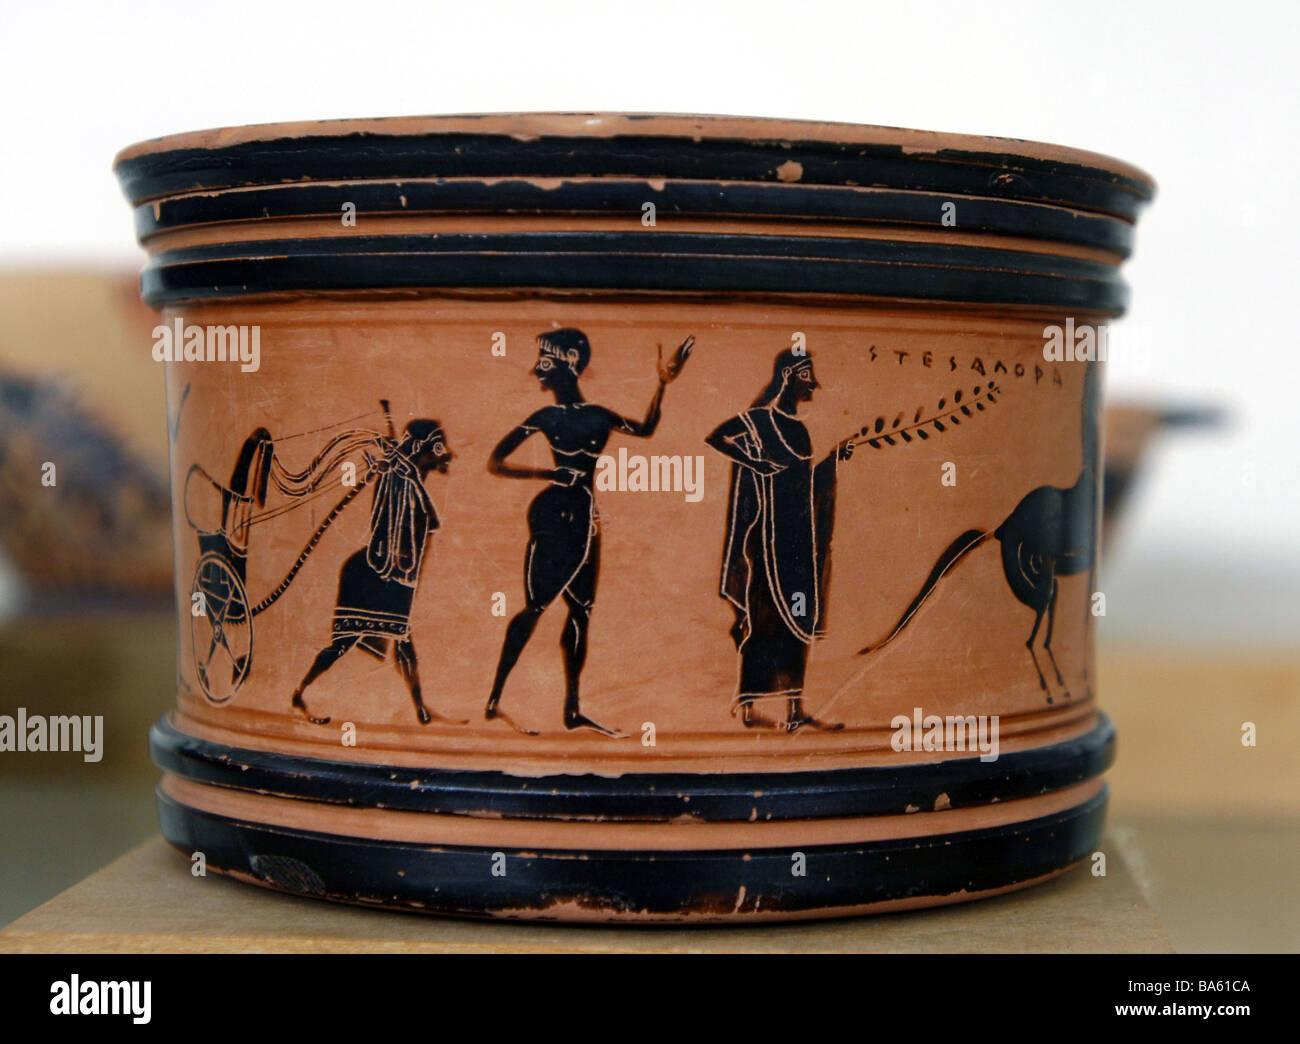 Greek vase painting stock photos greek vase painting stock greece attika varvrona museum vase painting europe sight culture exhibit exhibit antique historically art paints reviewsmspy